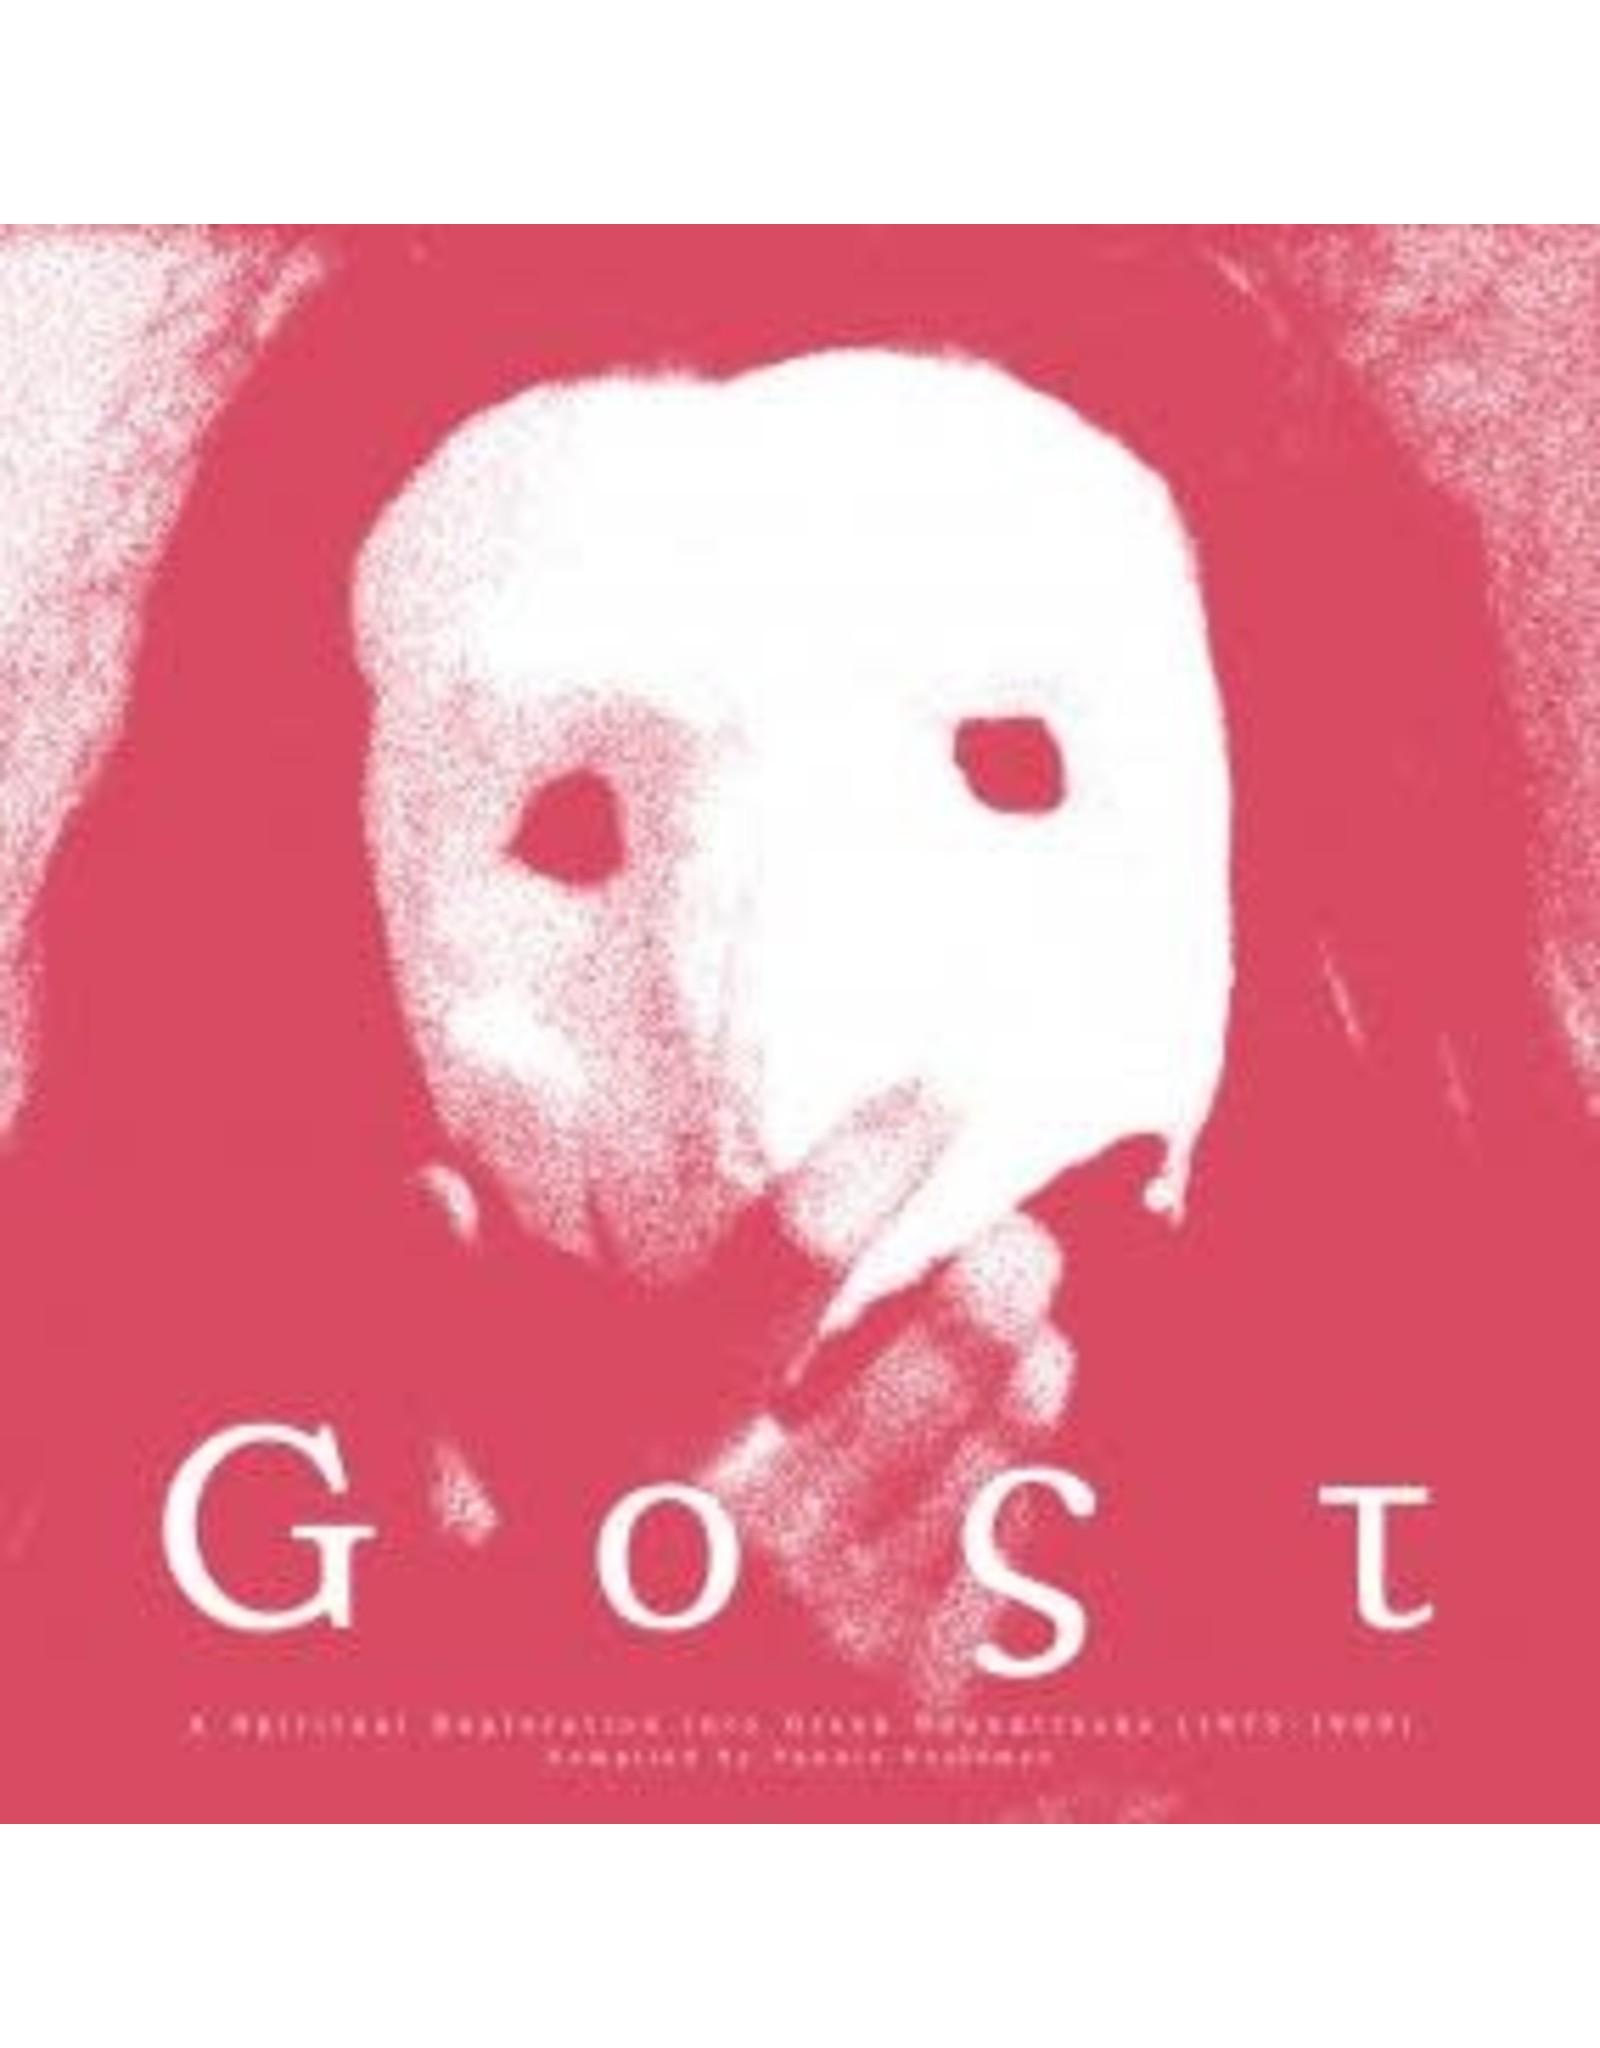 Into The Light Various: Gost: A Spiritual Exploration into Greek Sountracks (1975-1989) LP